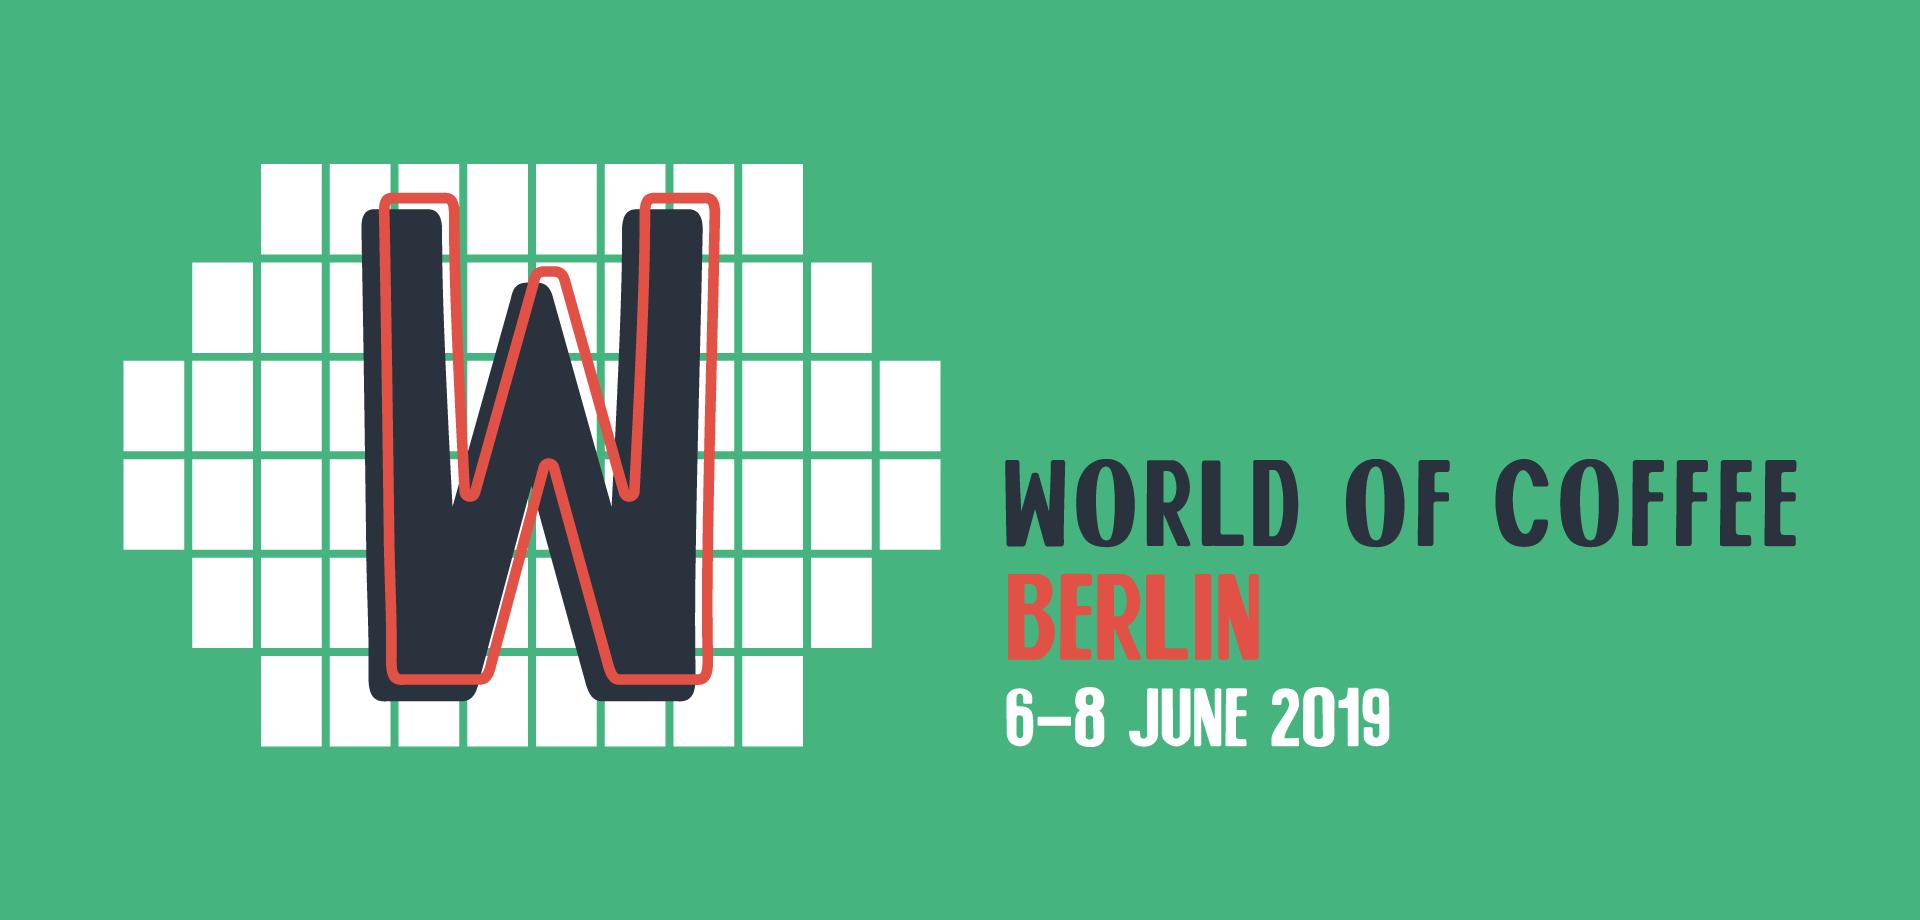 world-of-coffee-berlin-2019